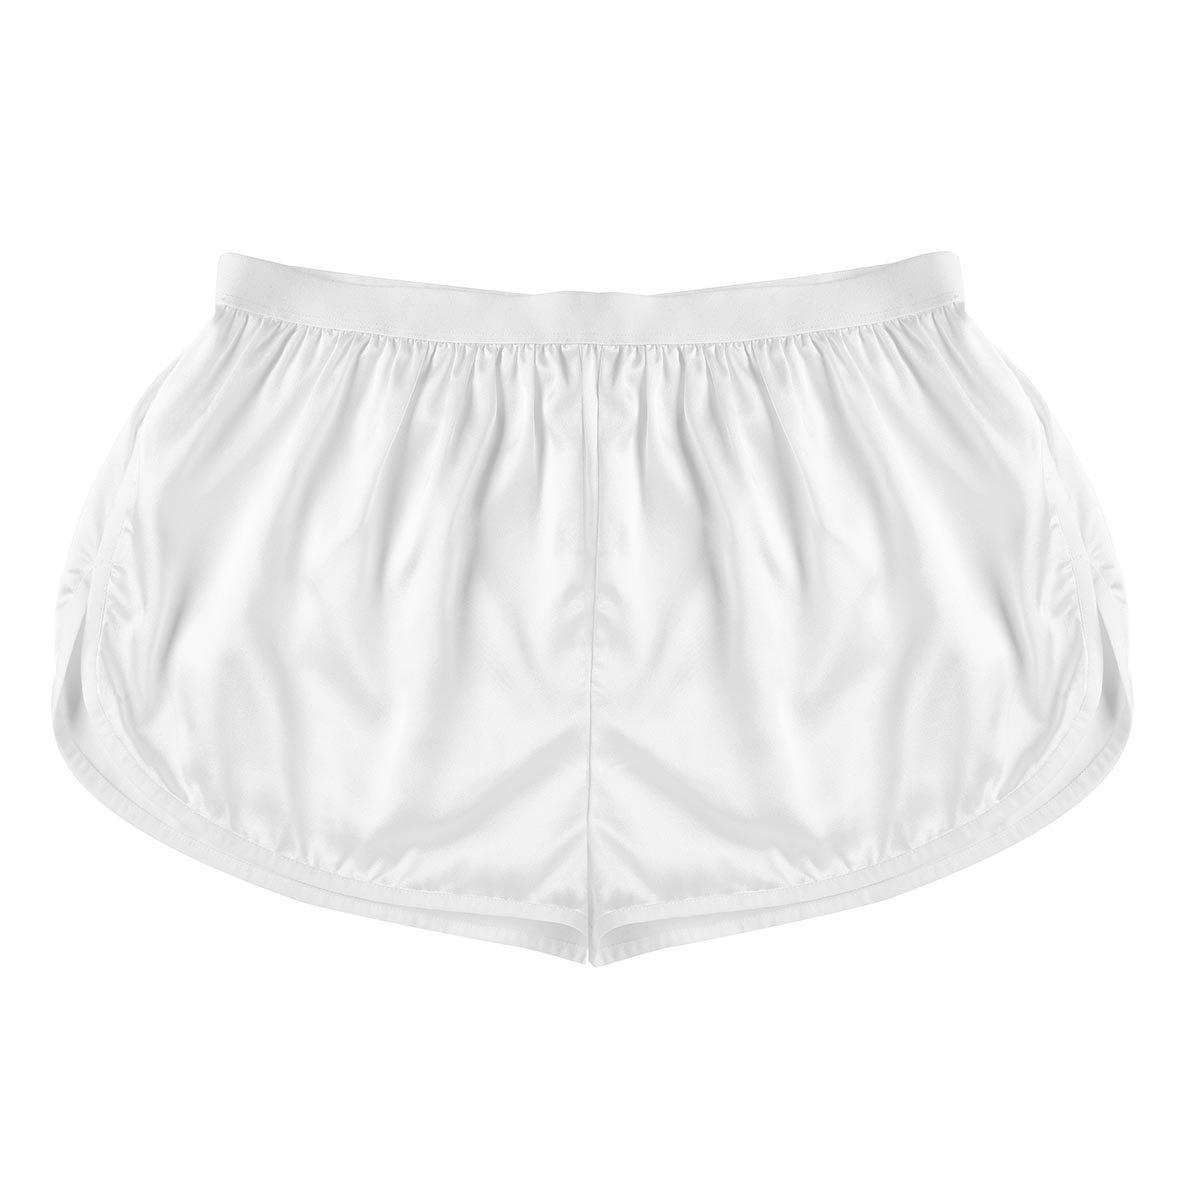 YiZYiF Men's Summer Silk Shorts Frilly Satin Boxer Briefs Casual Loose Underwear Ivory Medium(Waist 27.0-50.0''/69-126cm)